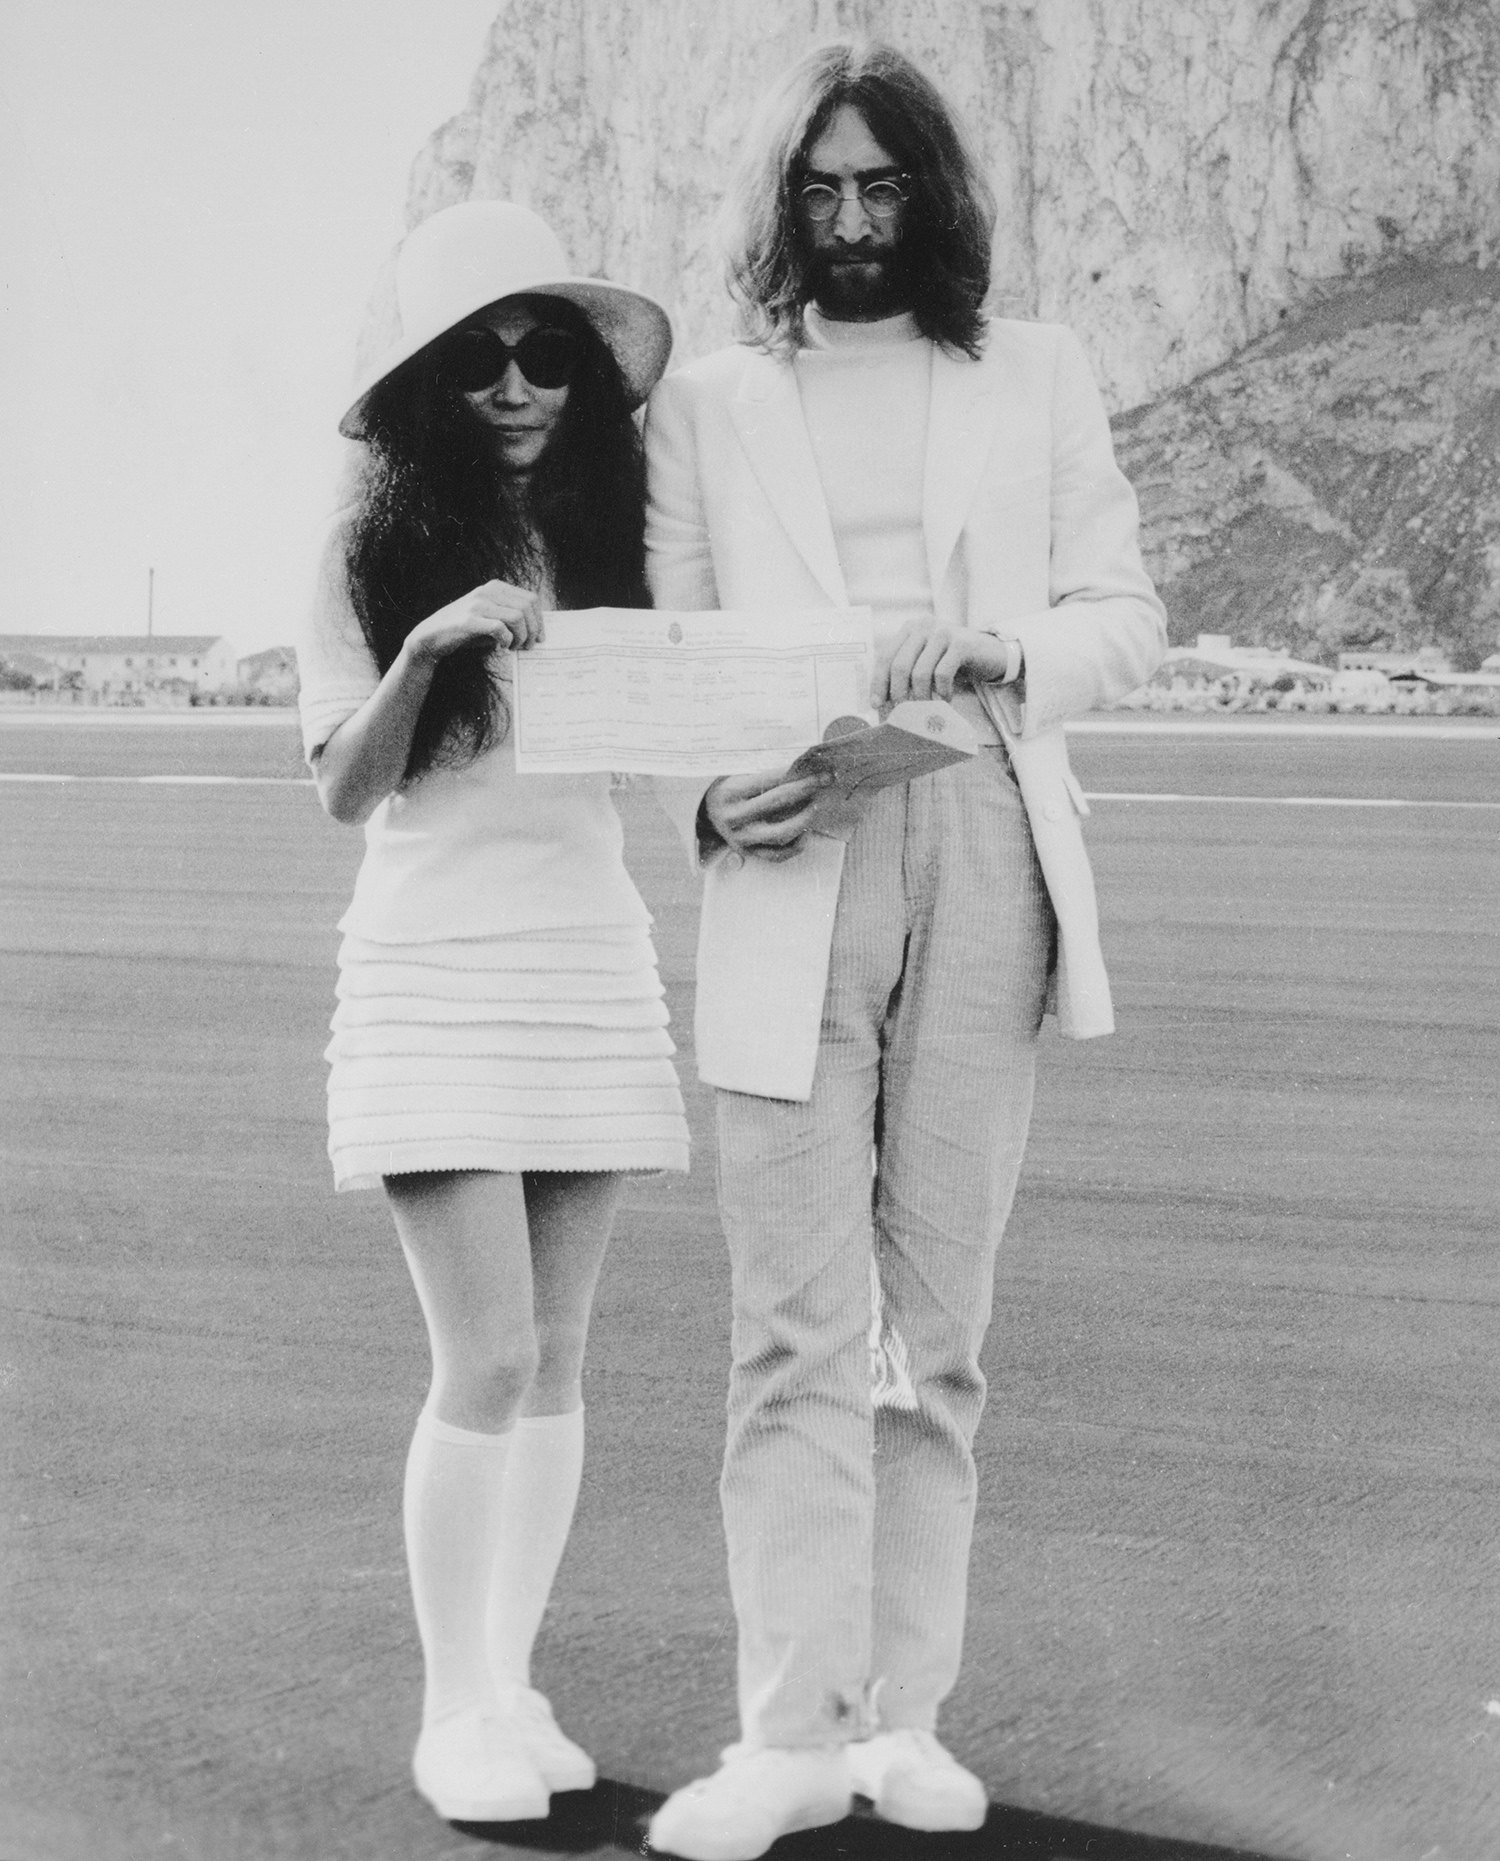 Йоко Оно иДжон Леннон, 1969